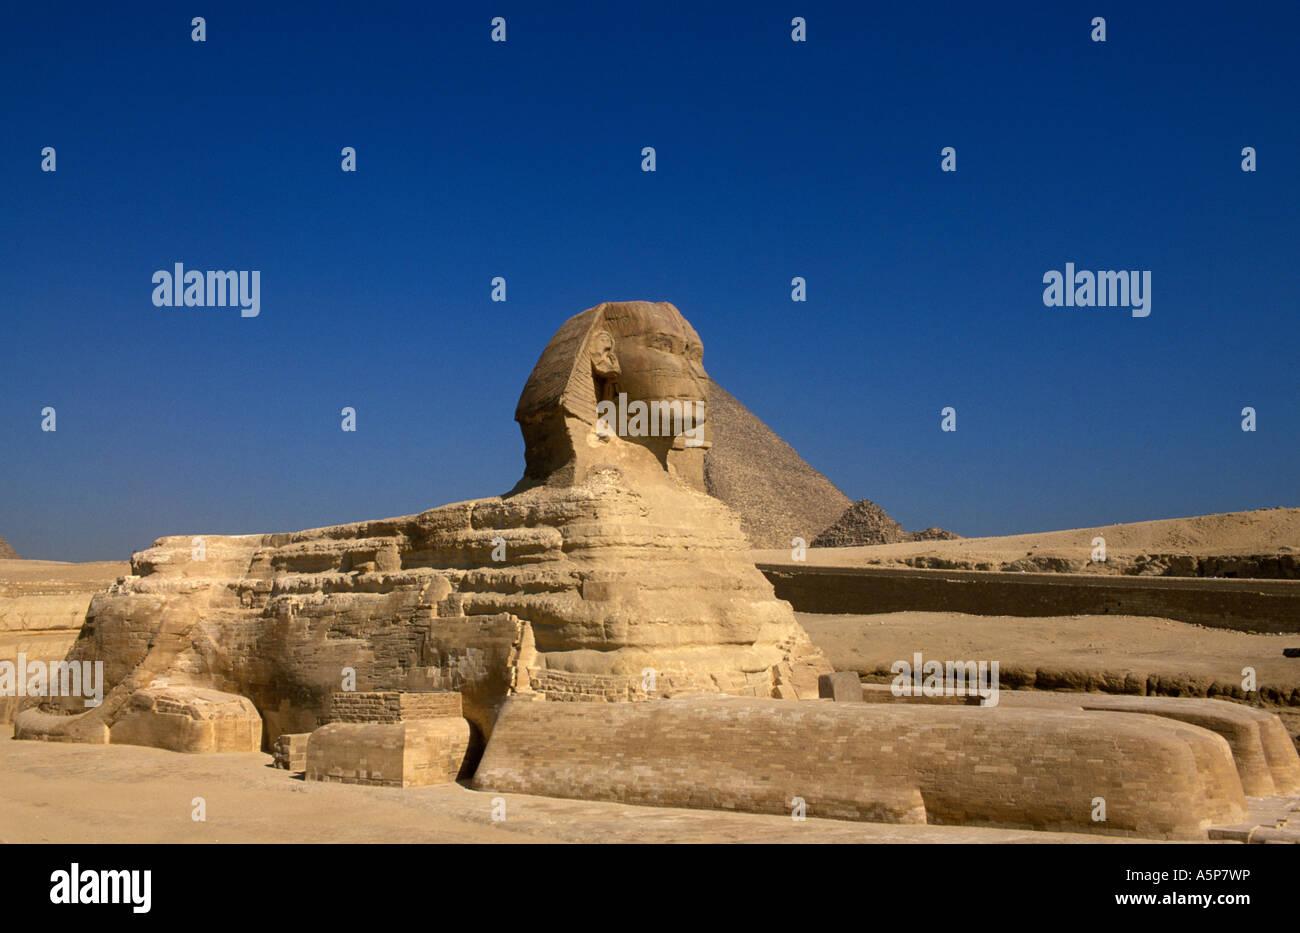 The Sphinx, Pyramids of Giza, Cairo, Egypt - Stock Image